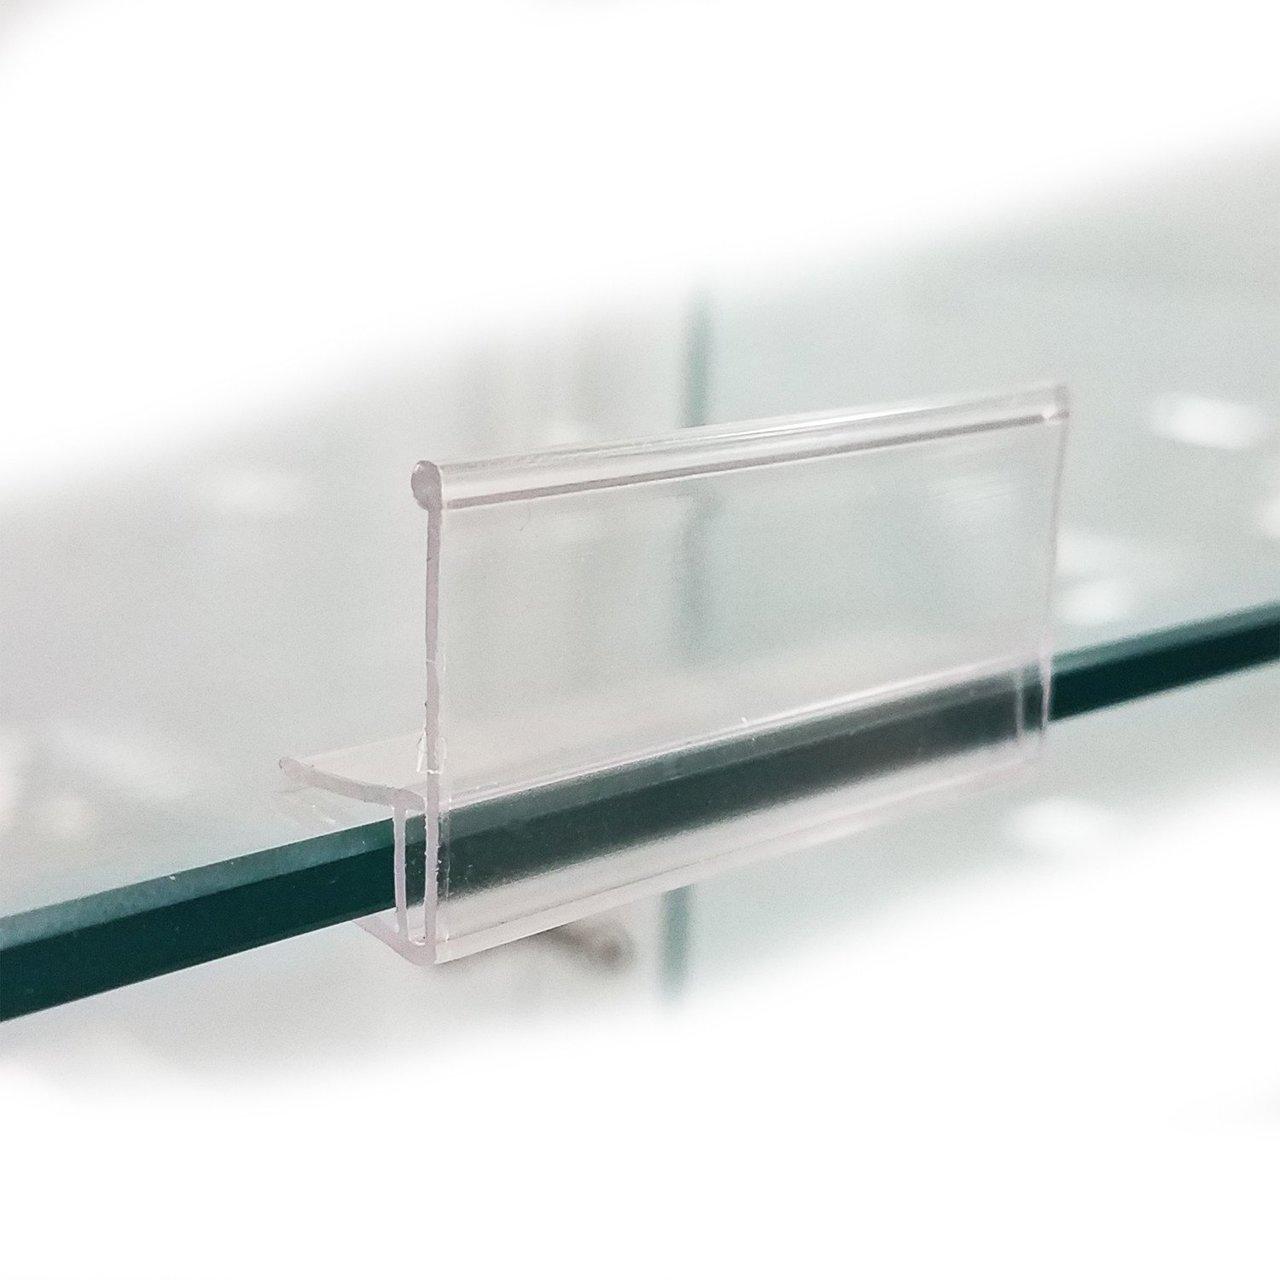 Enjoyable Glass Shelf Clip On Label Holder 50 Pack Home Interior And Landscaping Ferensignezvosmurscom